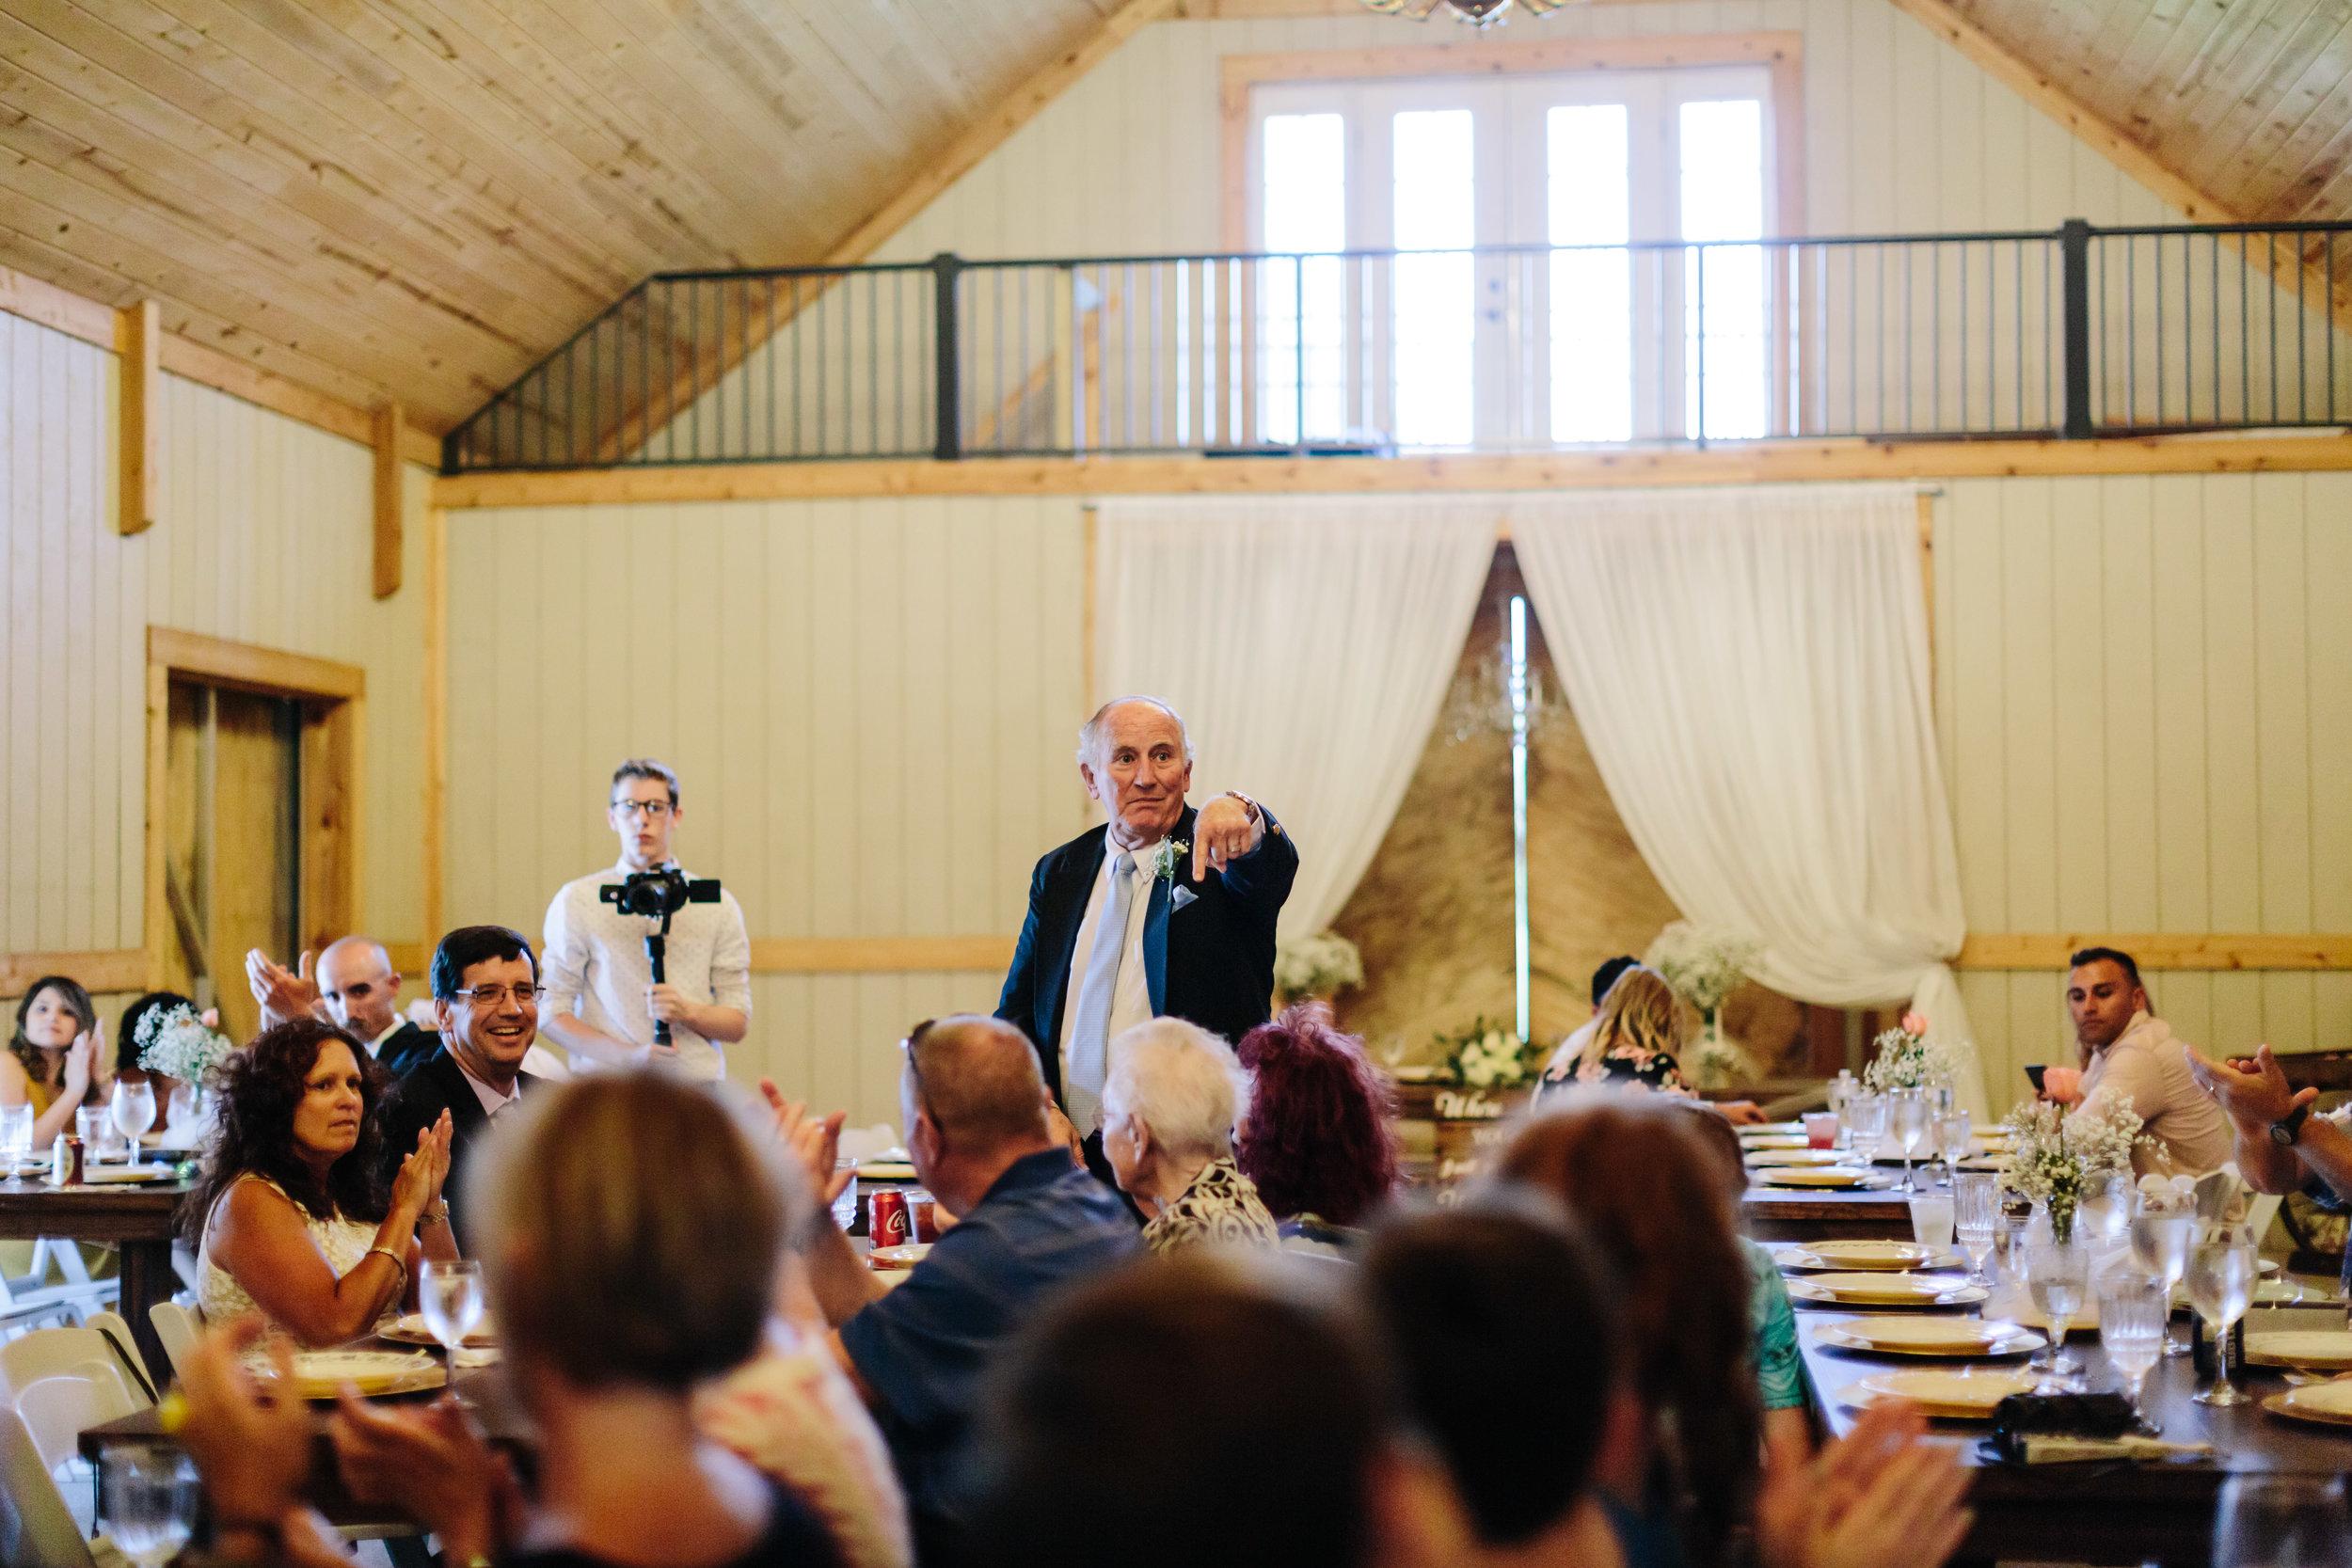 Griffin Wedding October Oaks Farm-513.jpg